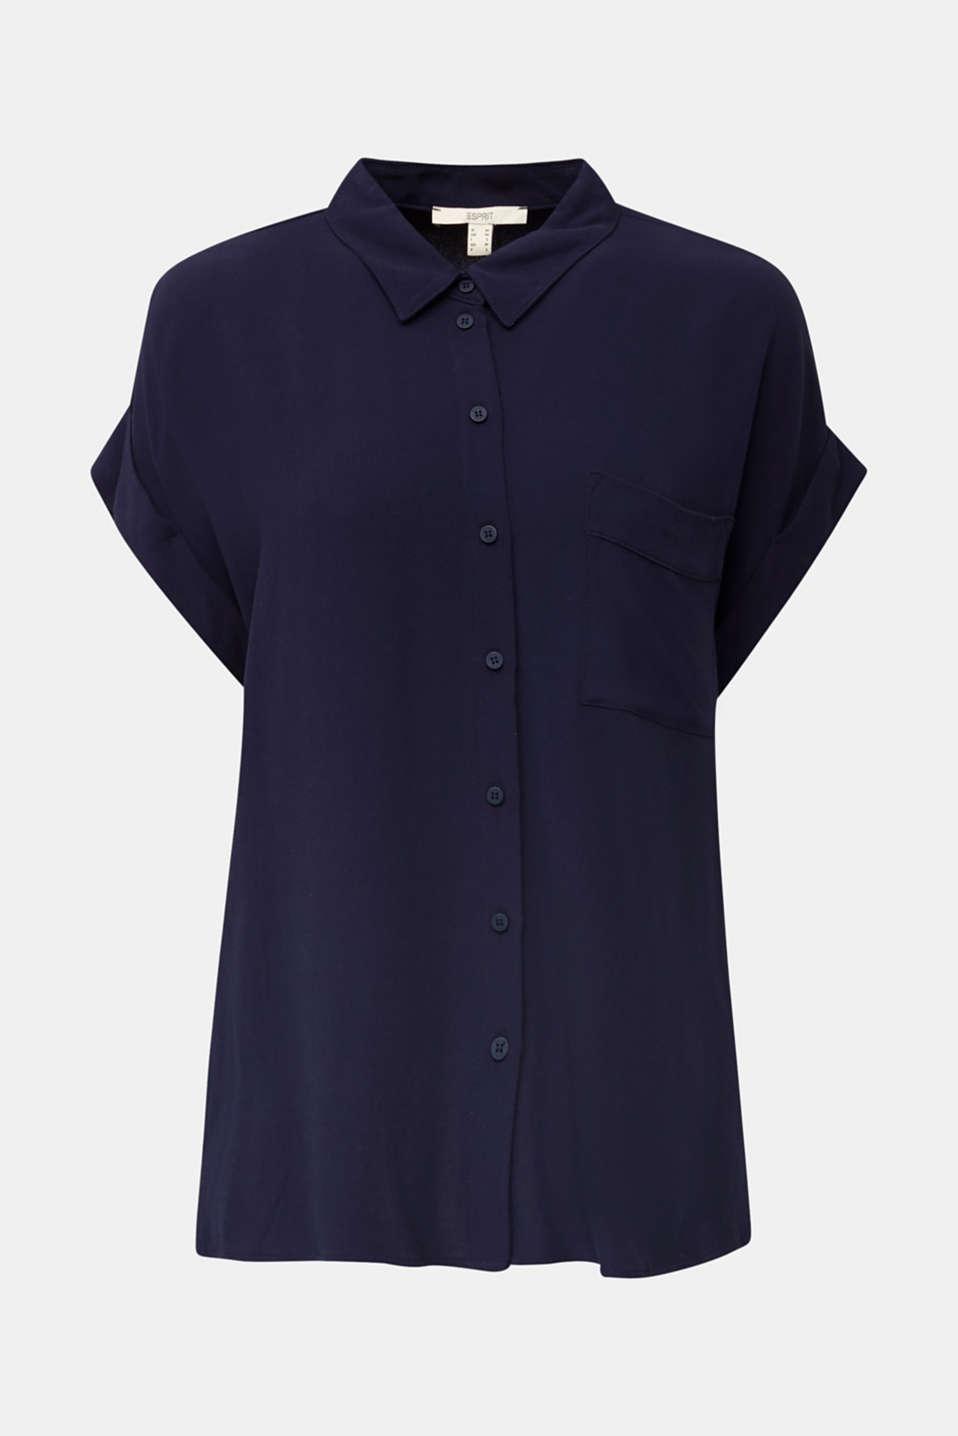 Crêpe blouse top, NAVY, detail image number 5